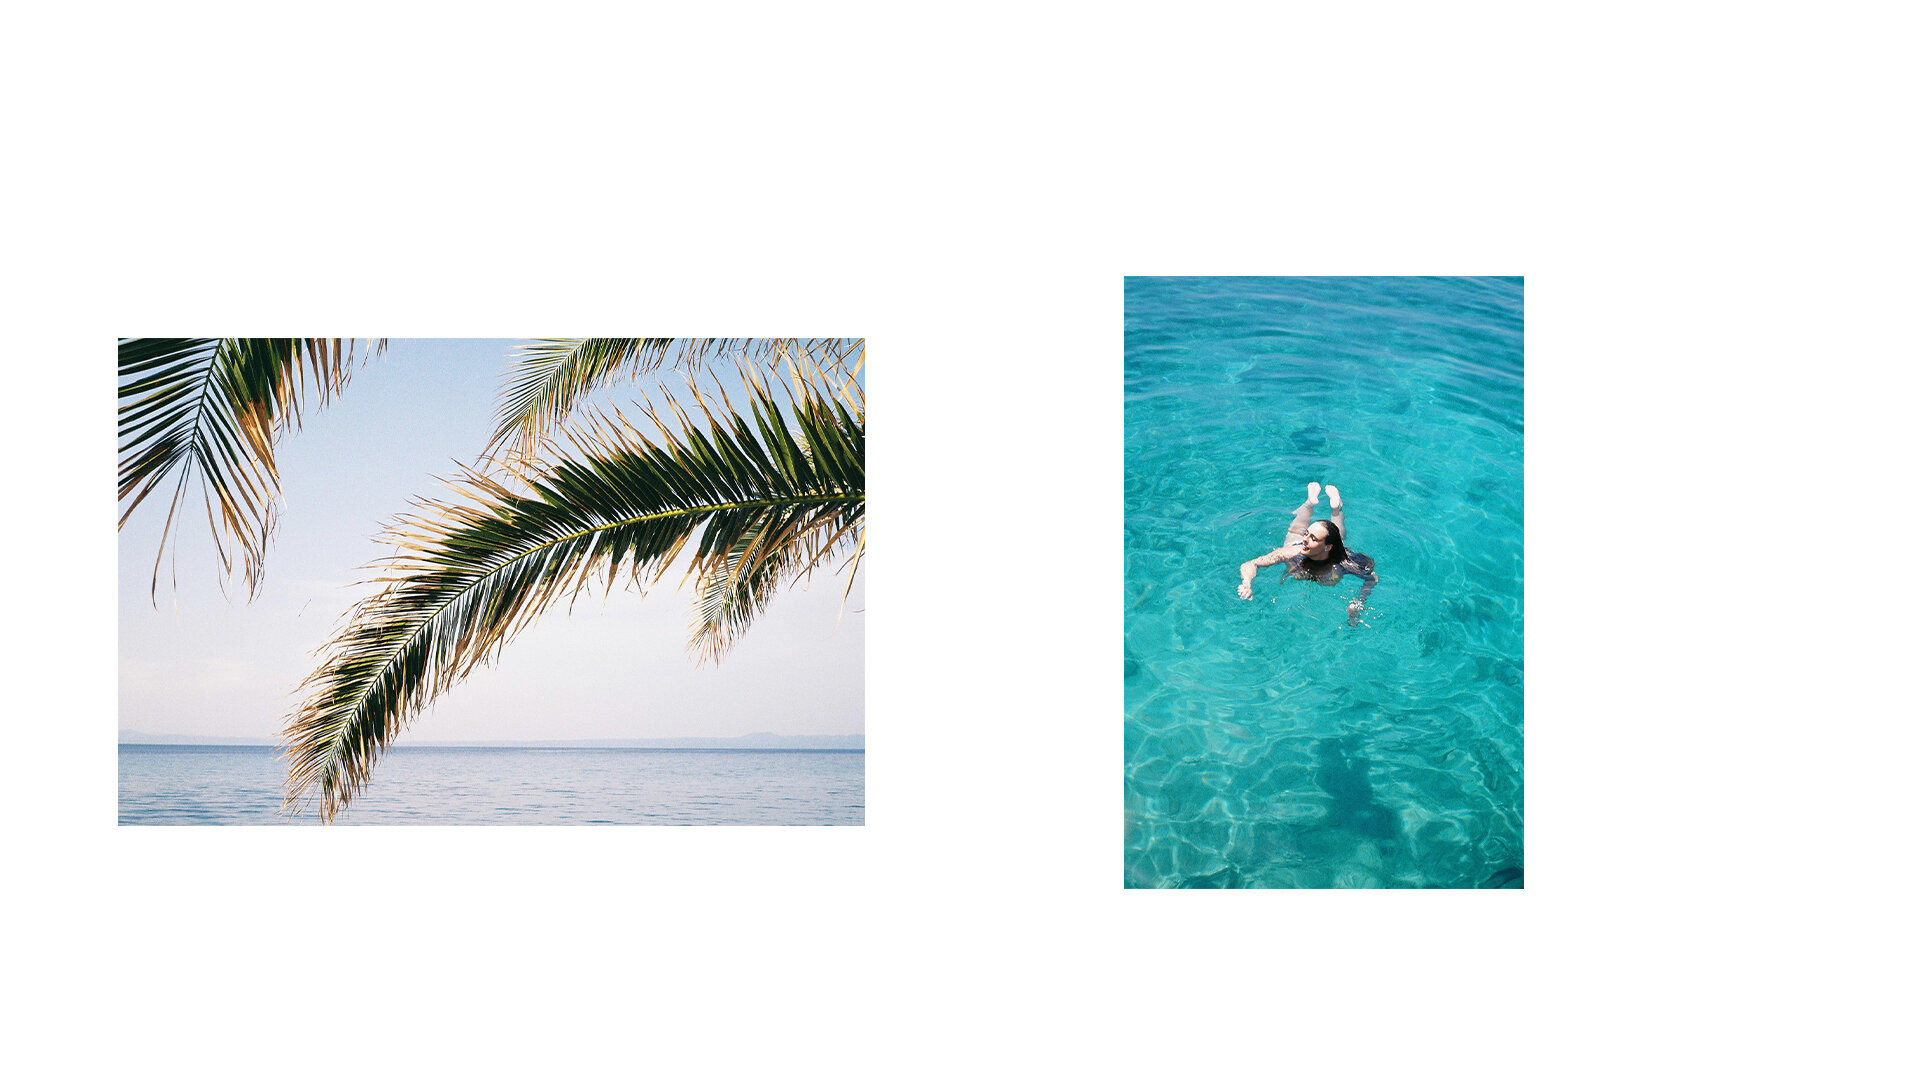 toby-butler-photo-tobybutlerphoto-lifestylephotography-travel-travelphotography-lifestyle-tourism-greece-film-35mm-magazine-europe-mediterranean-ocean-2.jpg